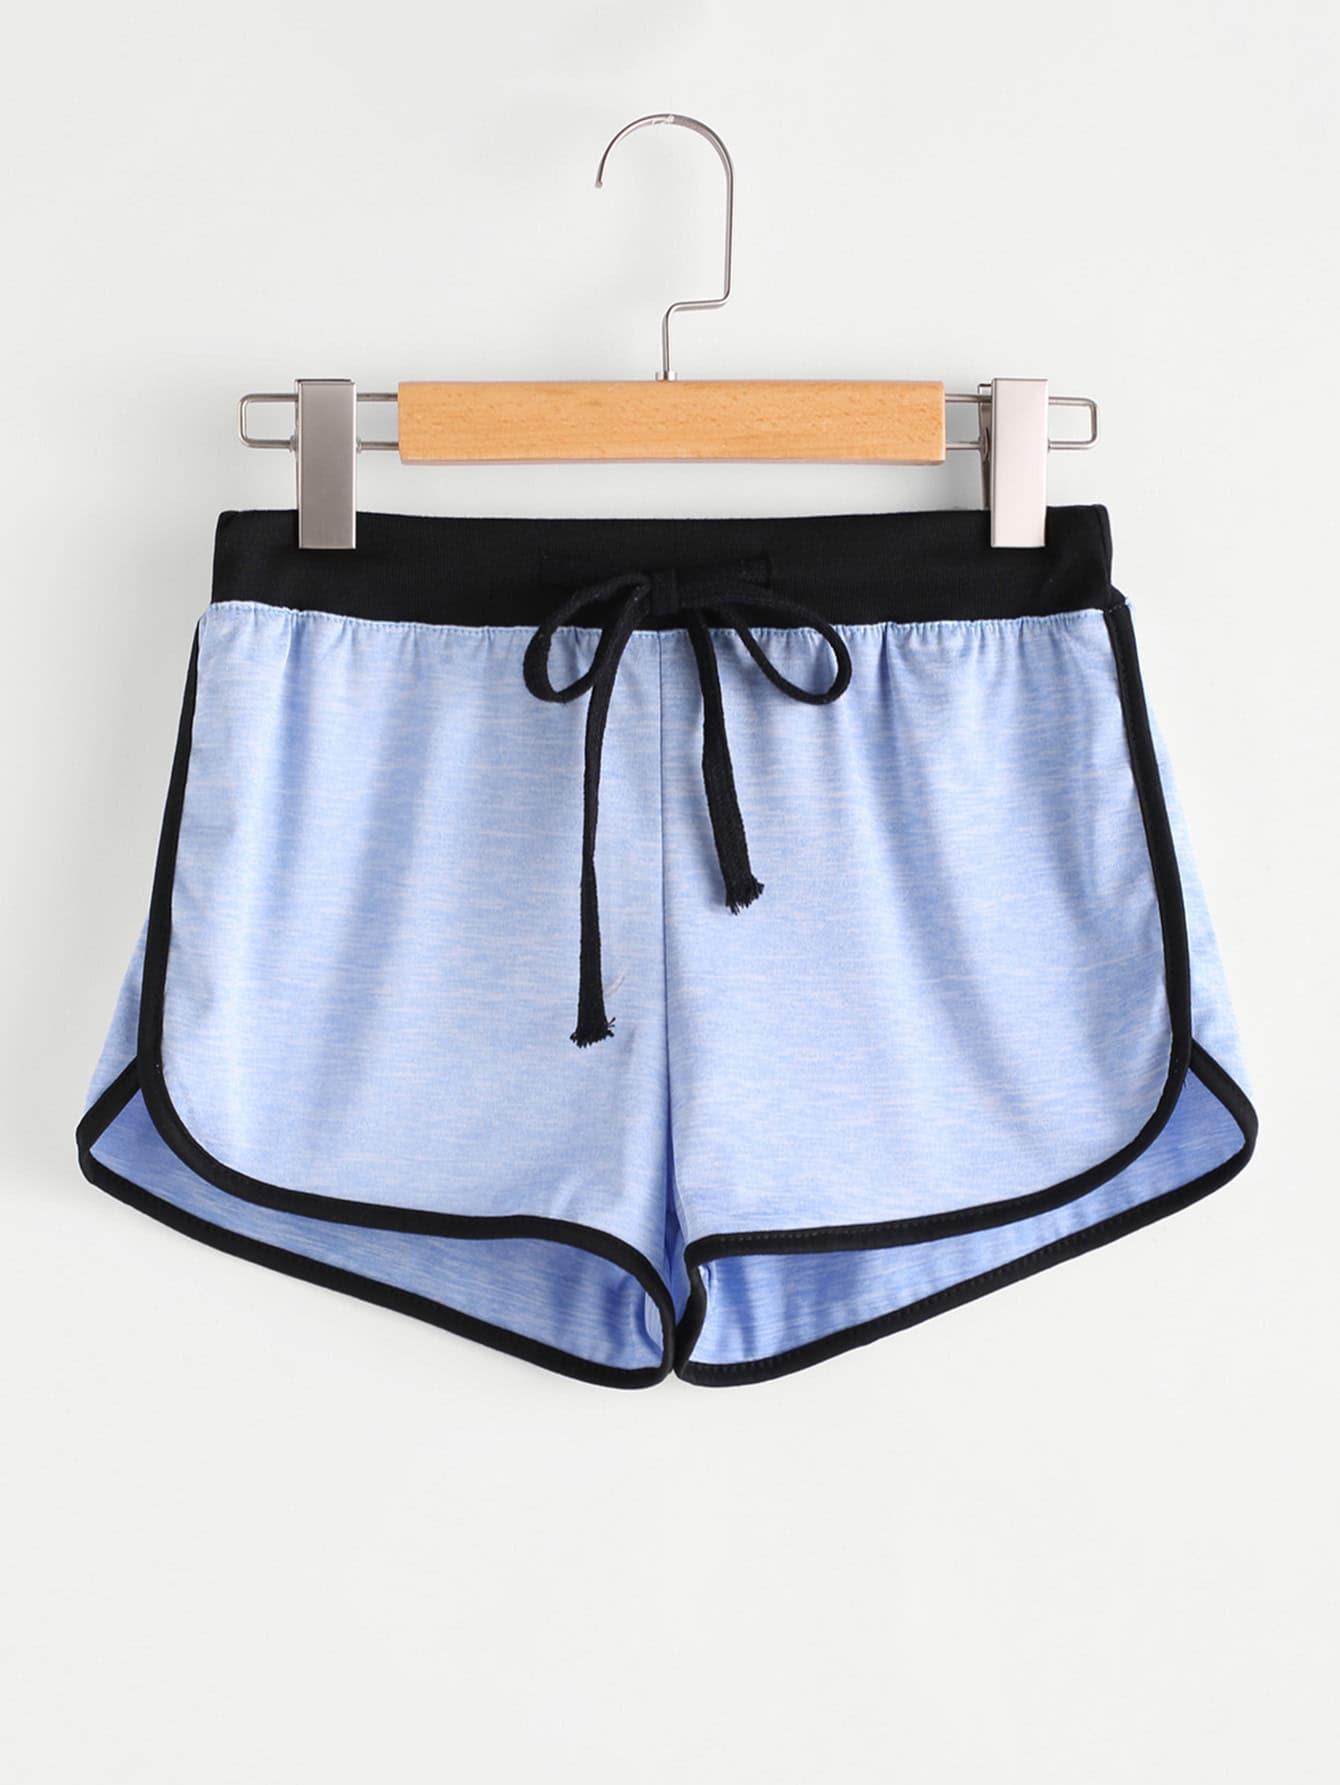 Drawstring Waist Ringer Shorts drawstring waist tie dyed shorts